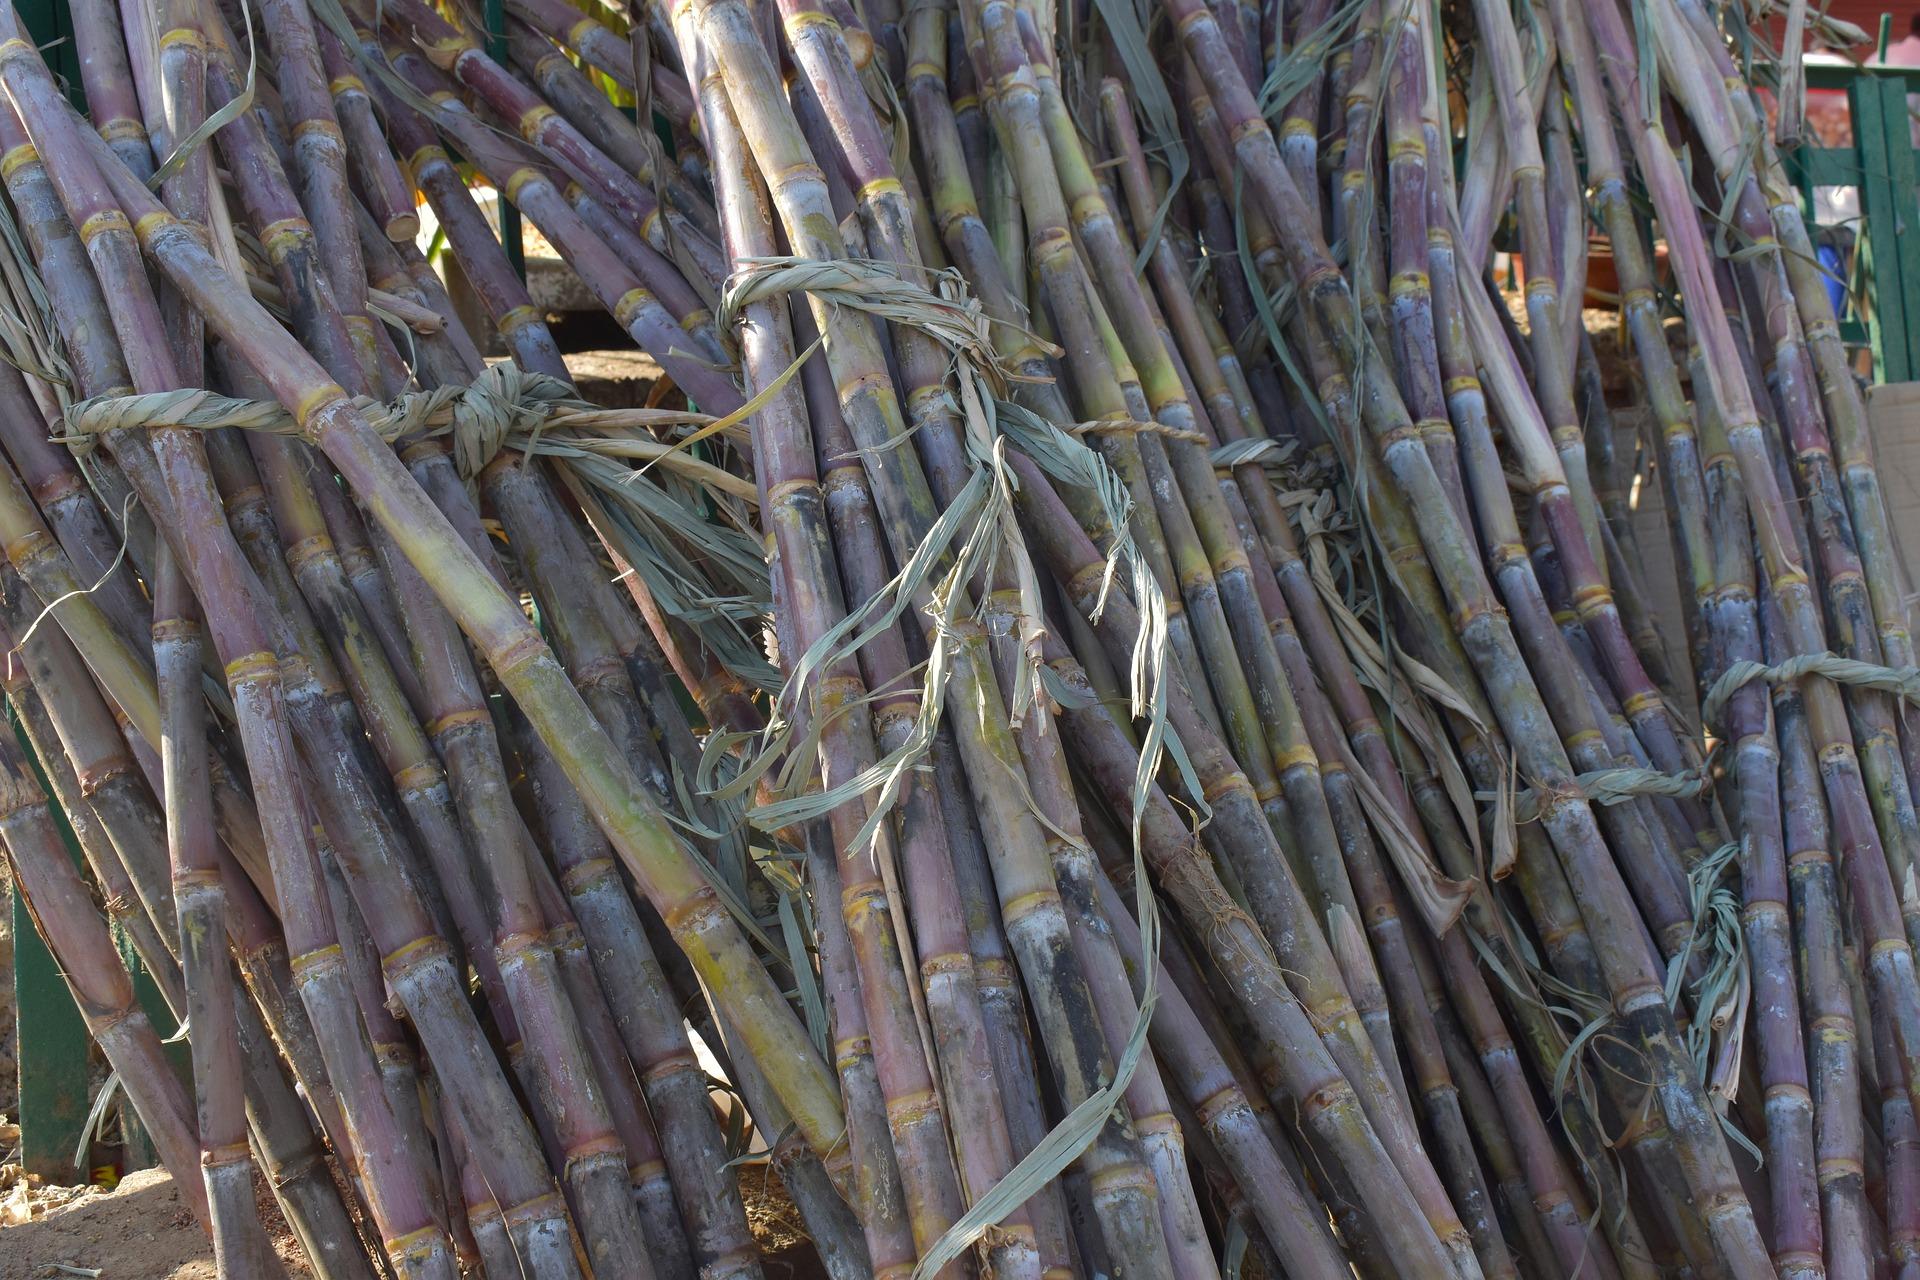 sugarcane-2857972_1920